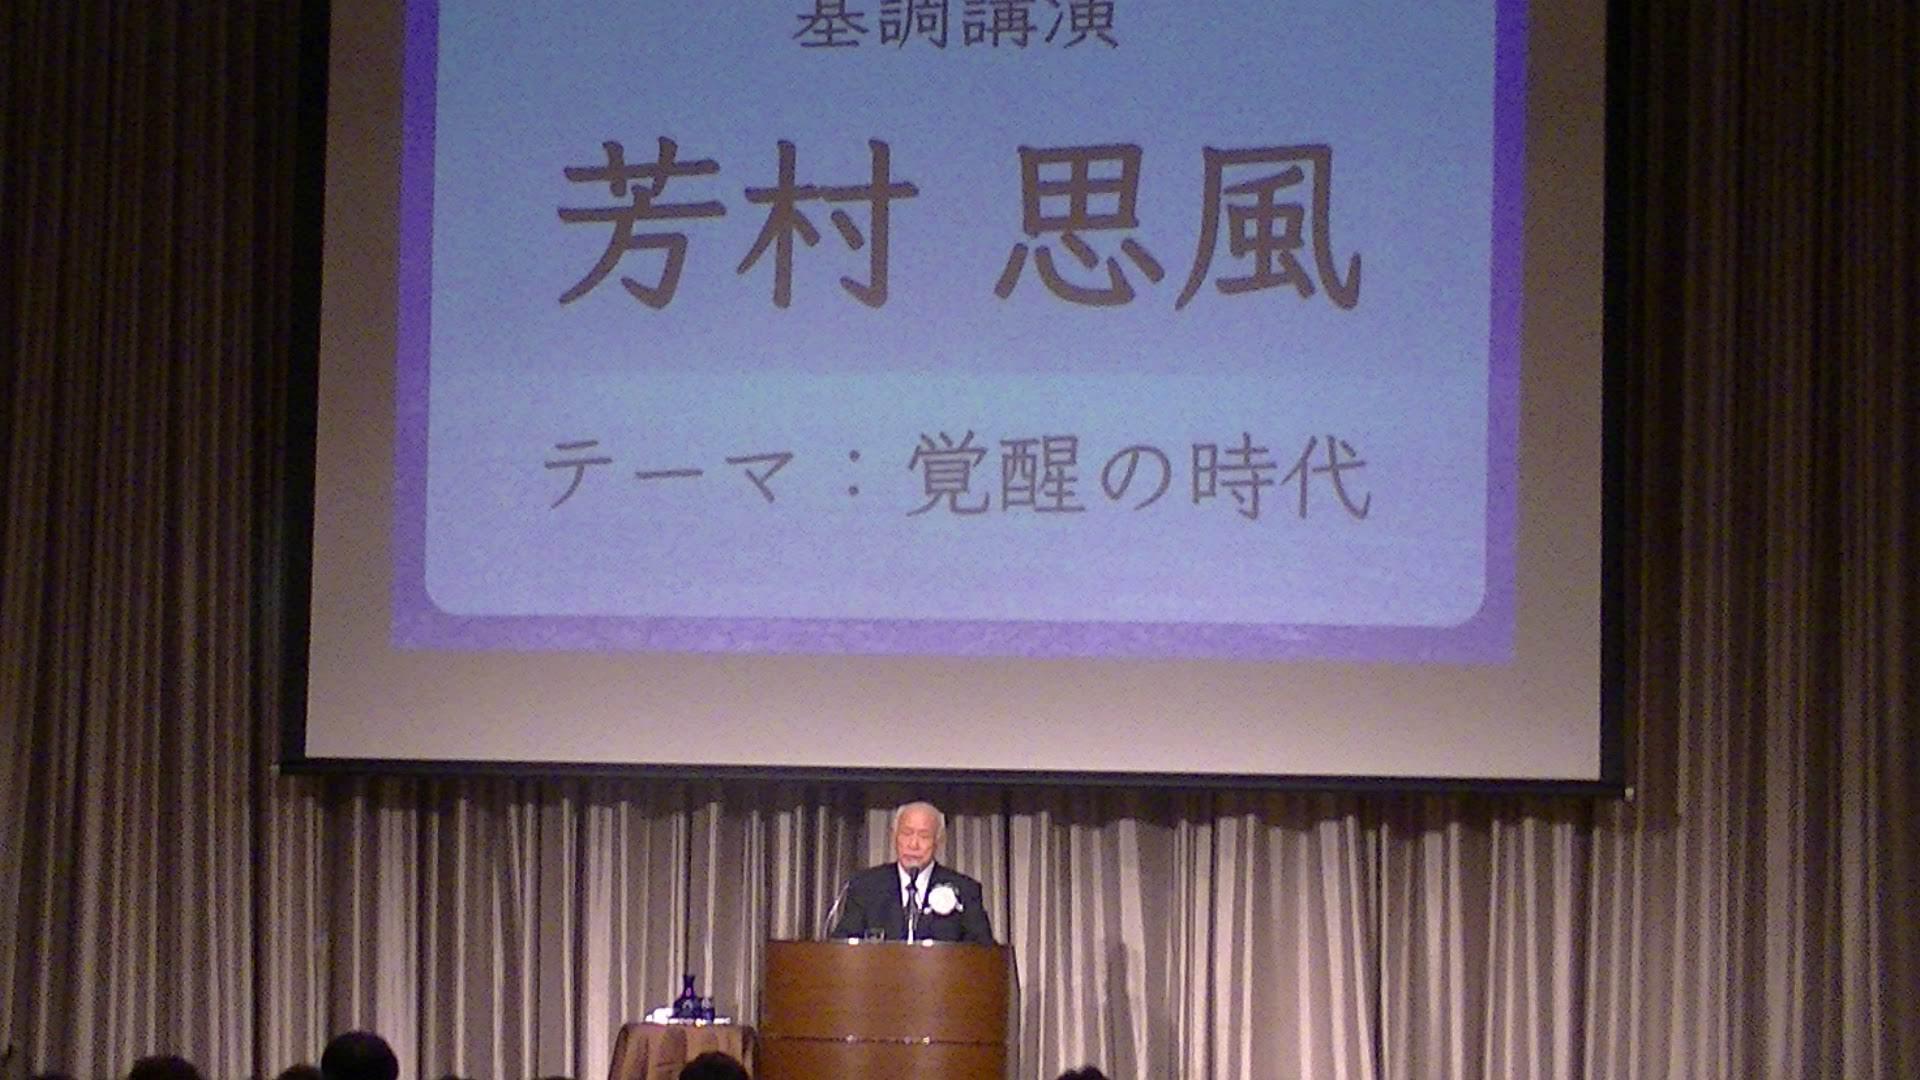 PIC 1639 1 - 思風会全国大会in広島